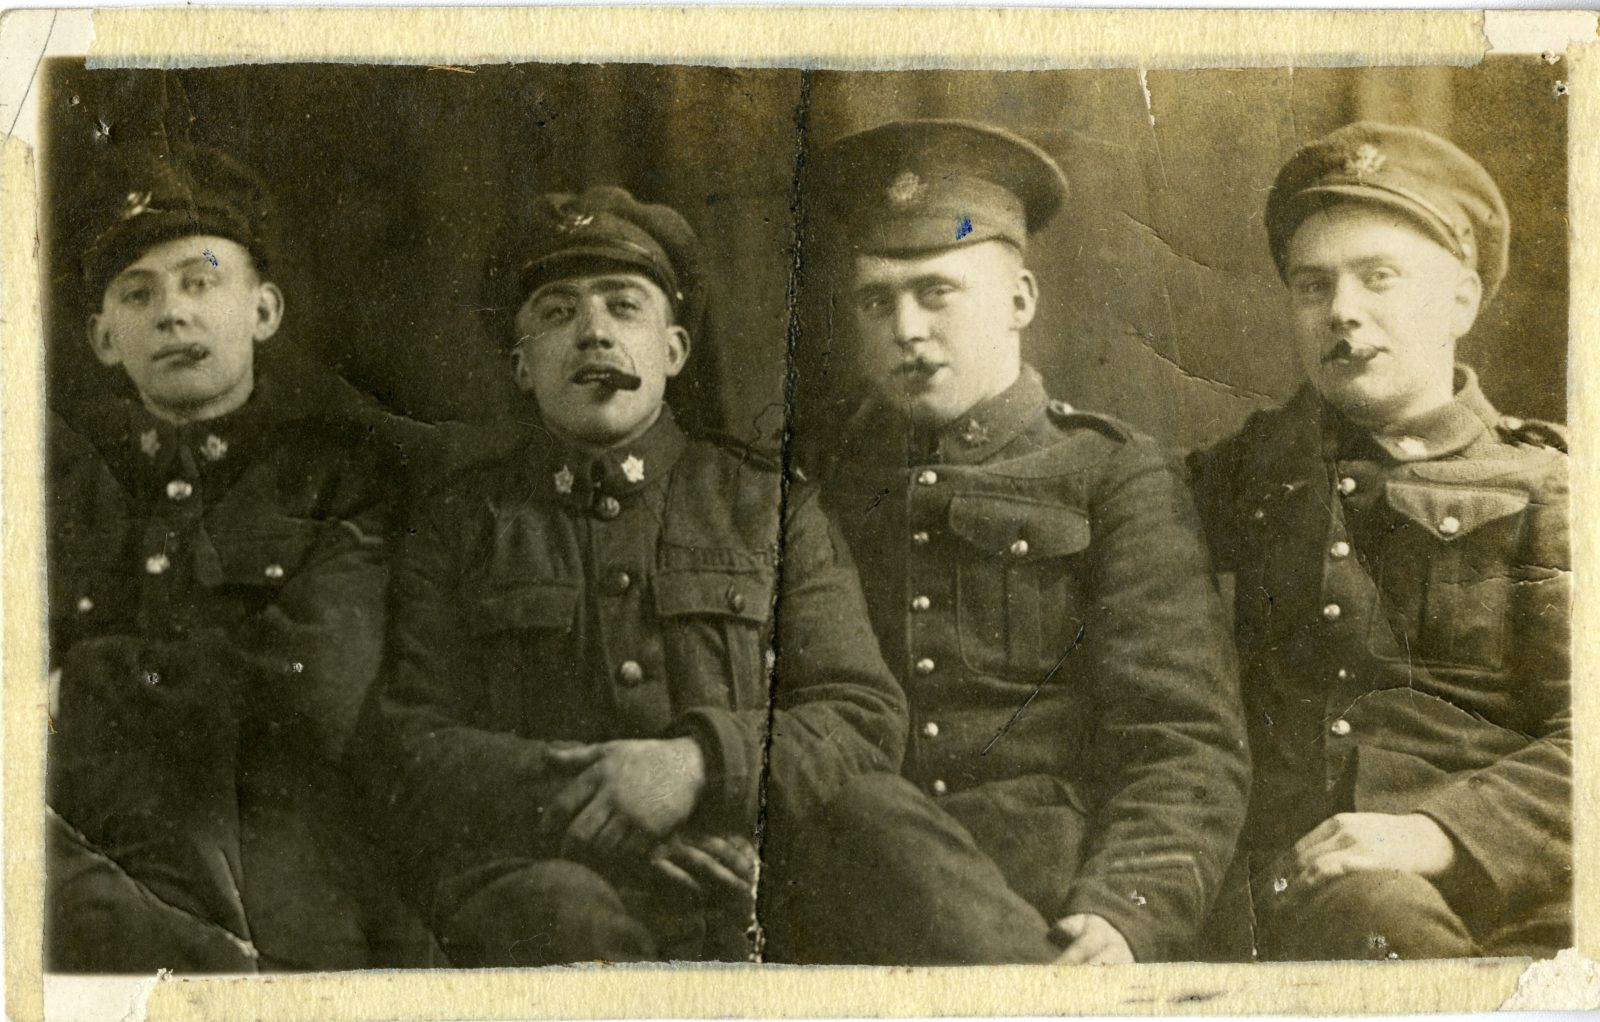 Allan Brindley, Harold Young, Lew Elliott, Unidentified